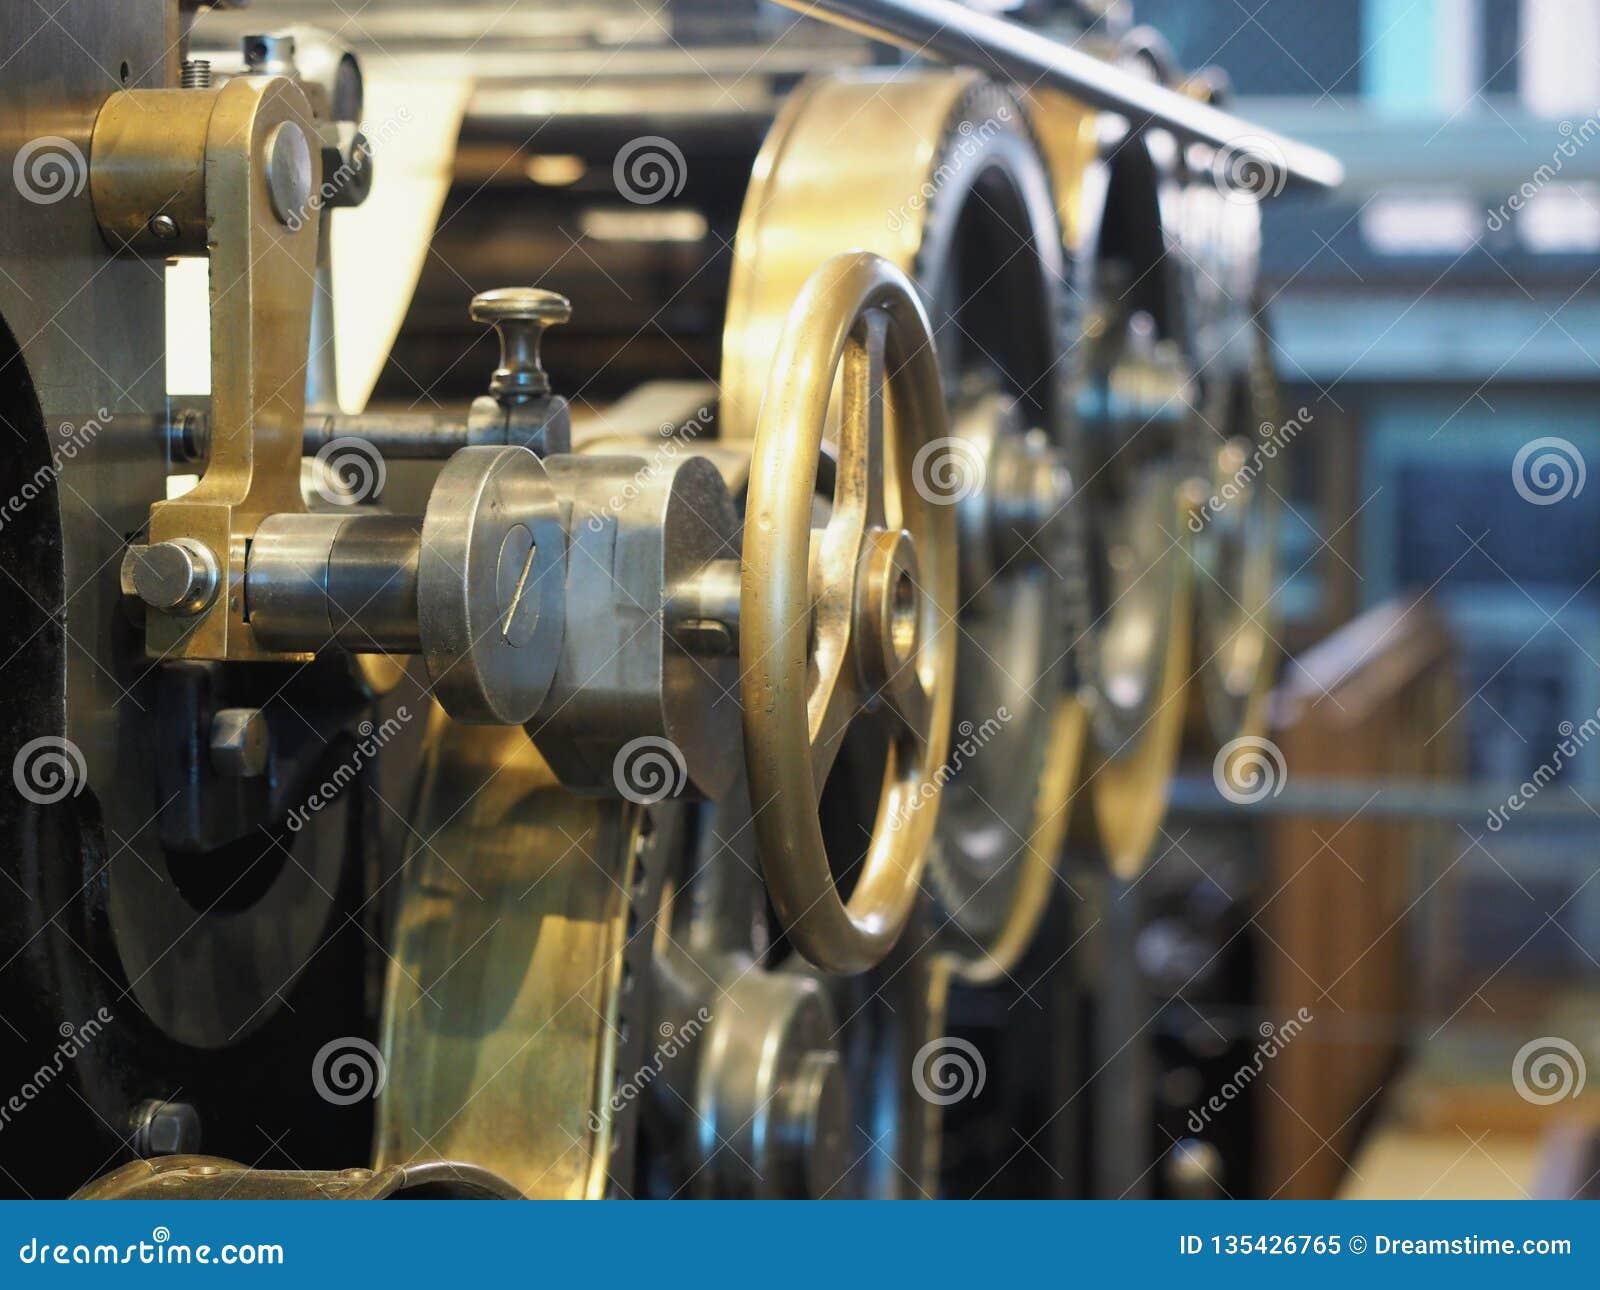 Old printing press. Сlose up view